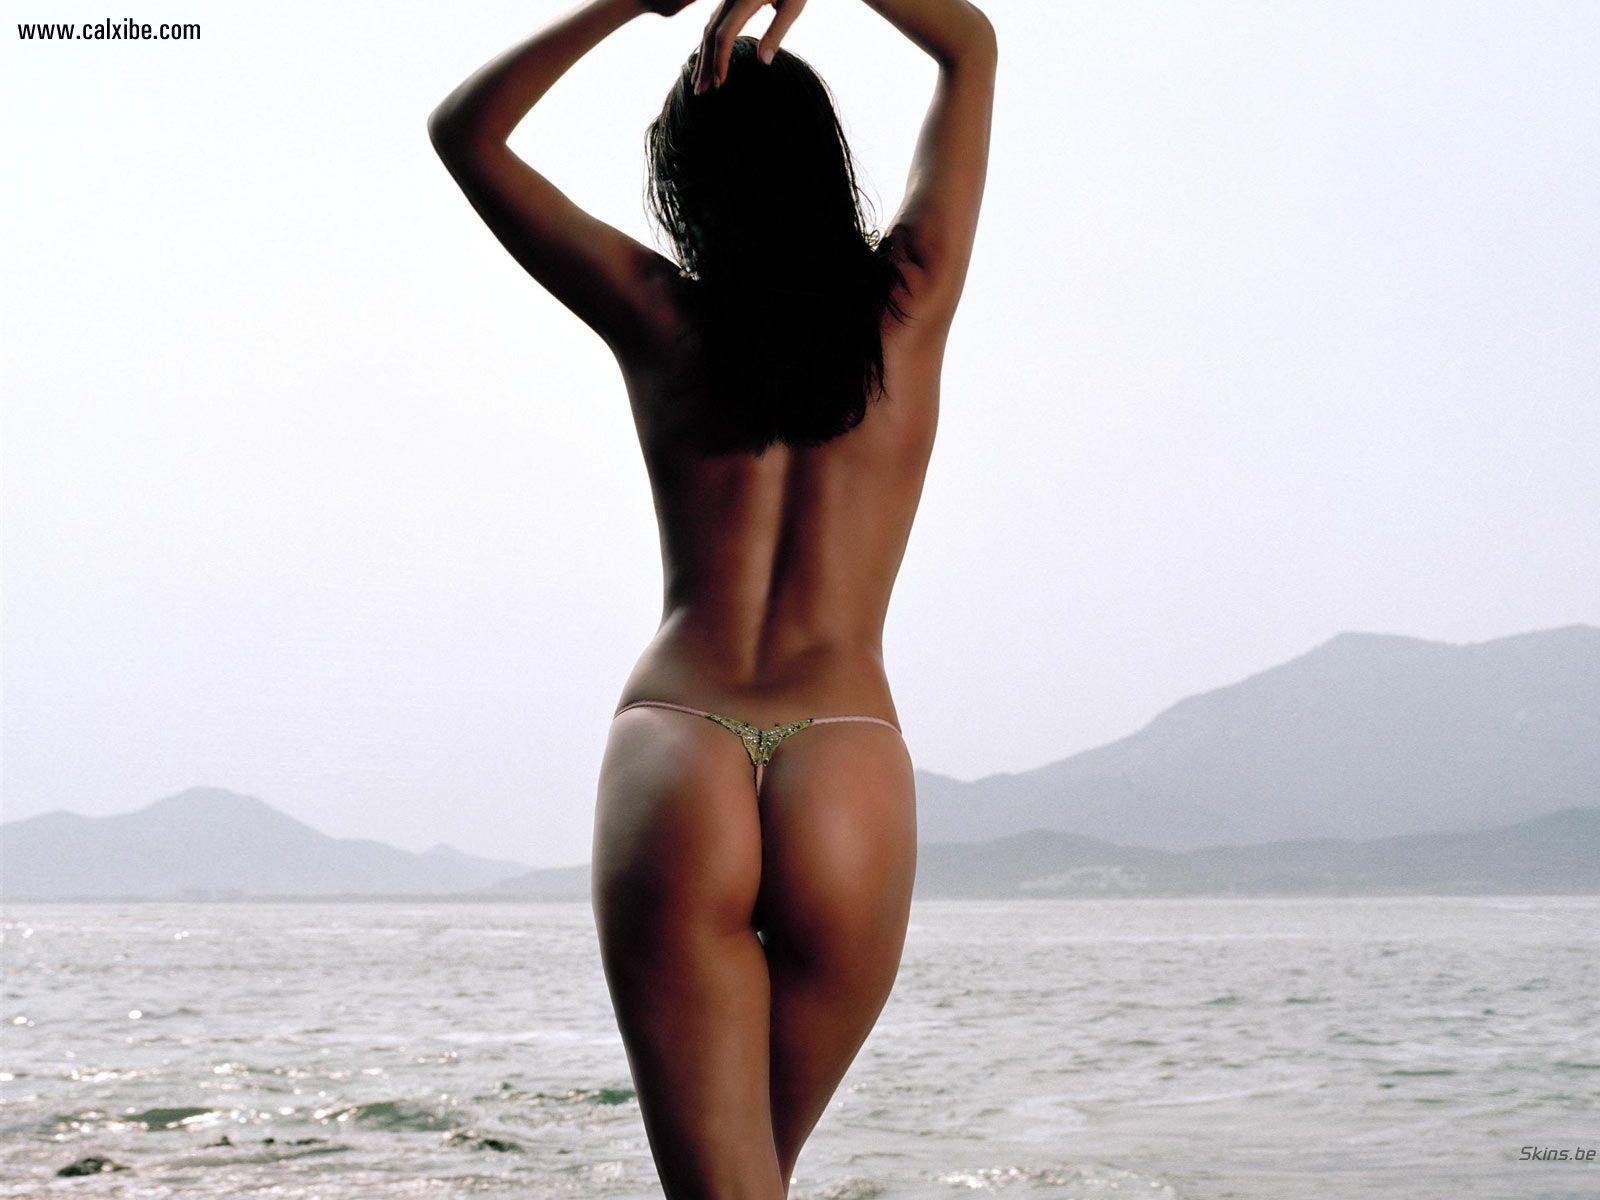 Pussy Annett Fletcher nudes (76 photos), Sexy, Is a cute, Twitter, underwear 2015